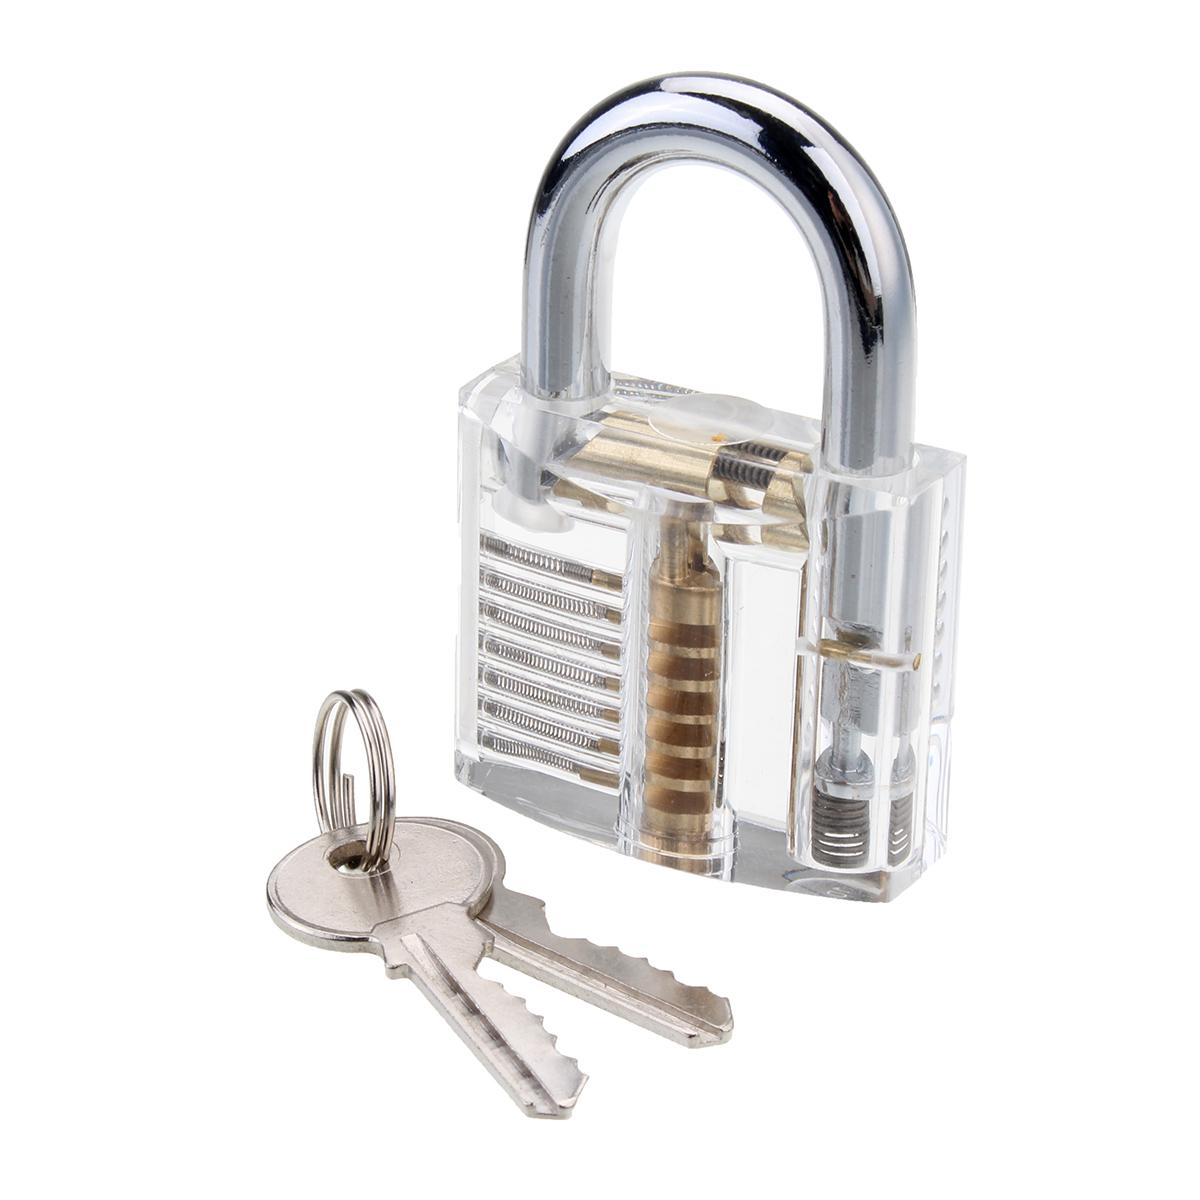 26pcs Lock Pick Training Tool W/ Clear Transparent Practice Padlock Set Locksmith